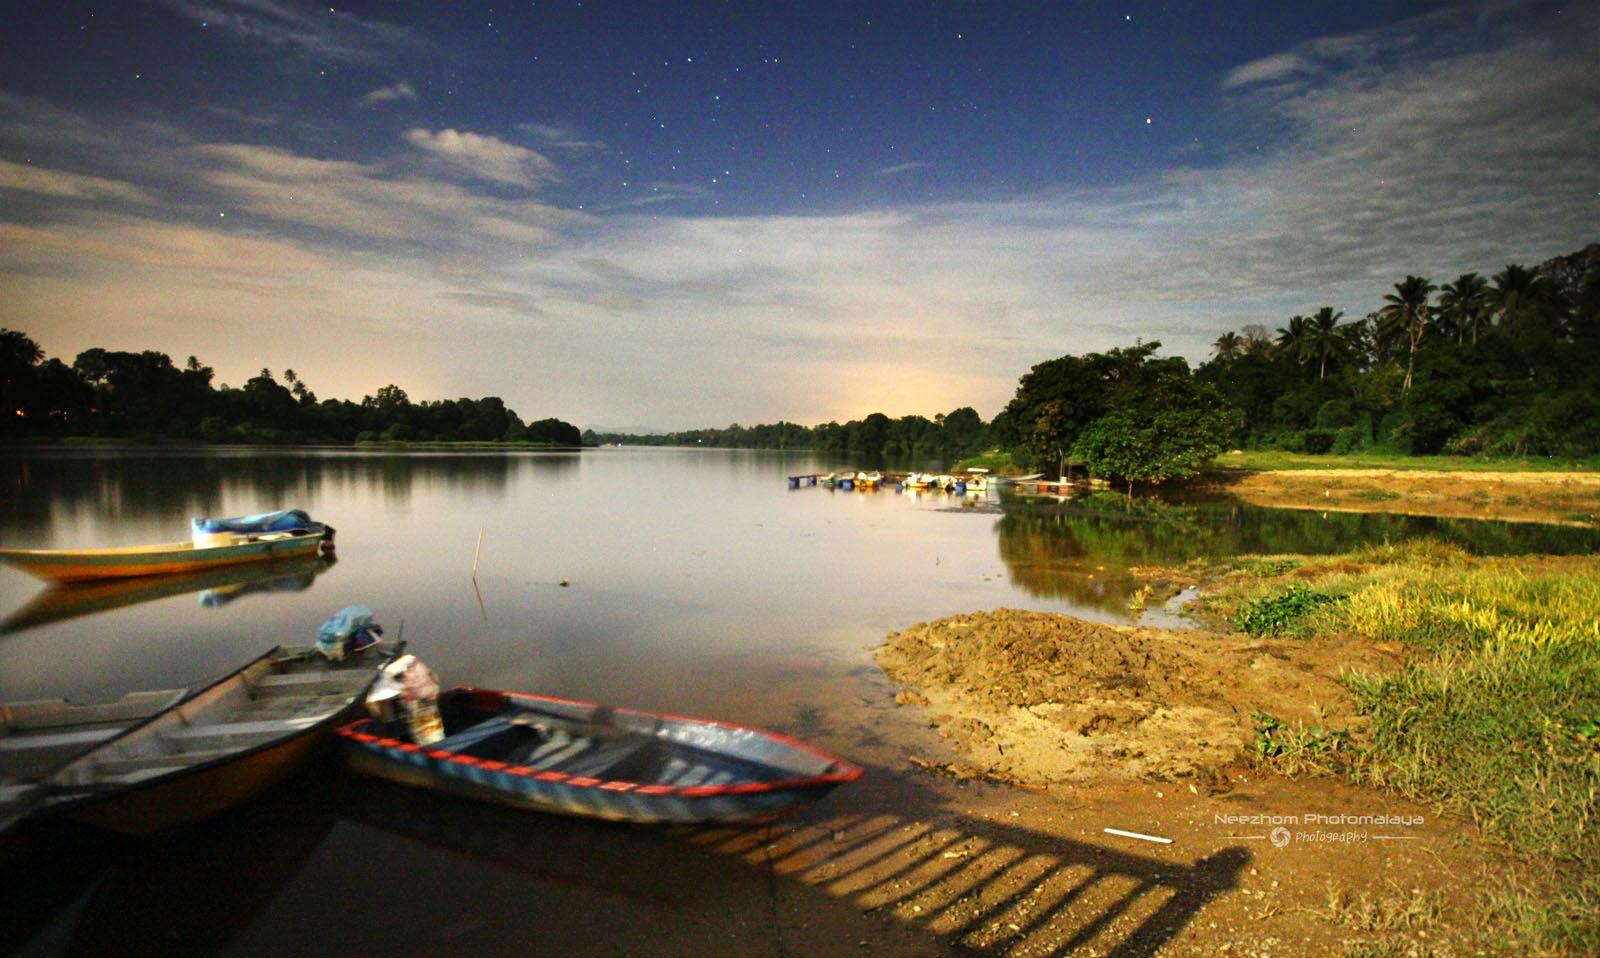 Sungai di kampung Batu Hampar night shot